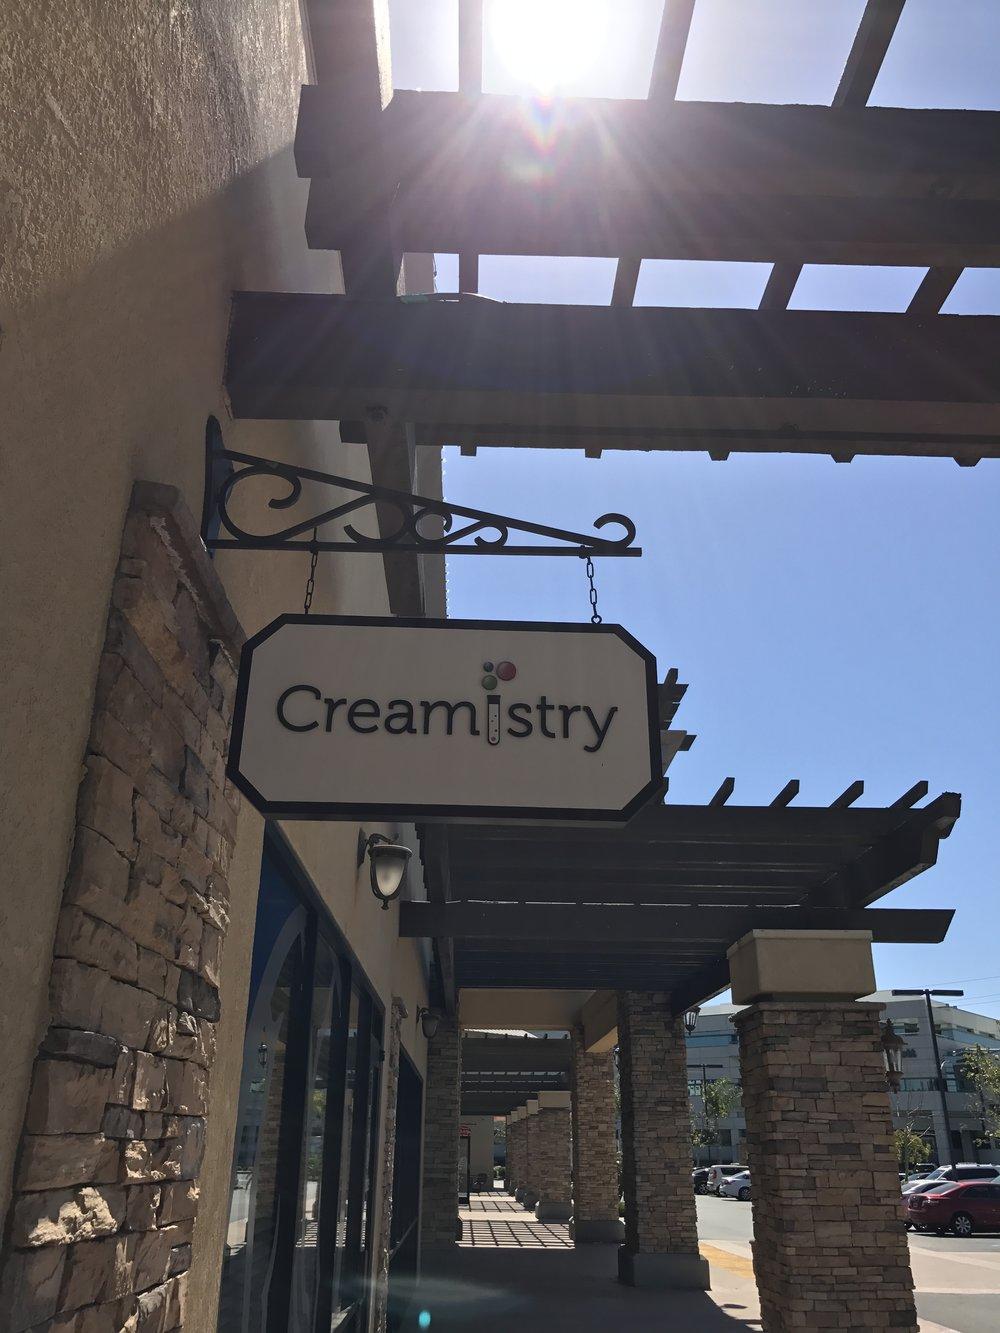 Creamistry Temecula